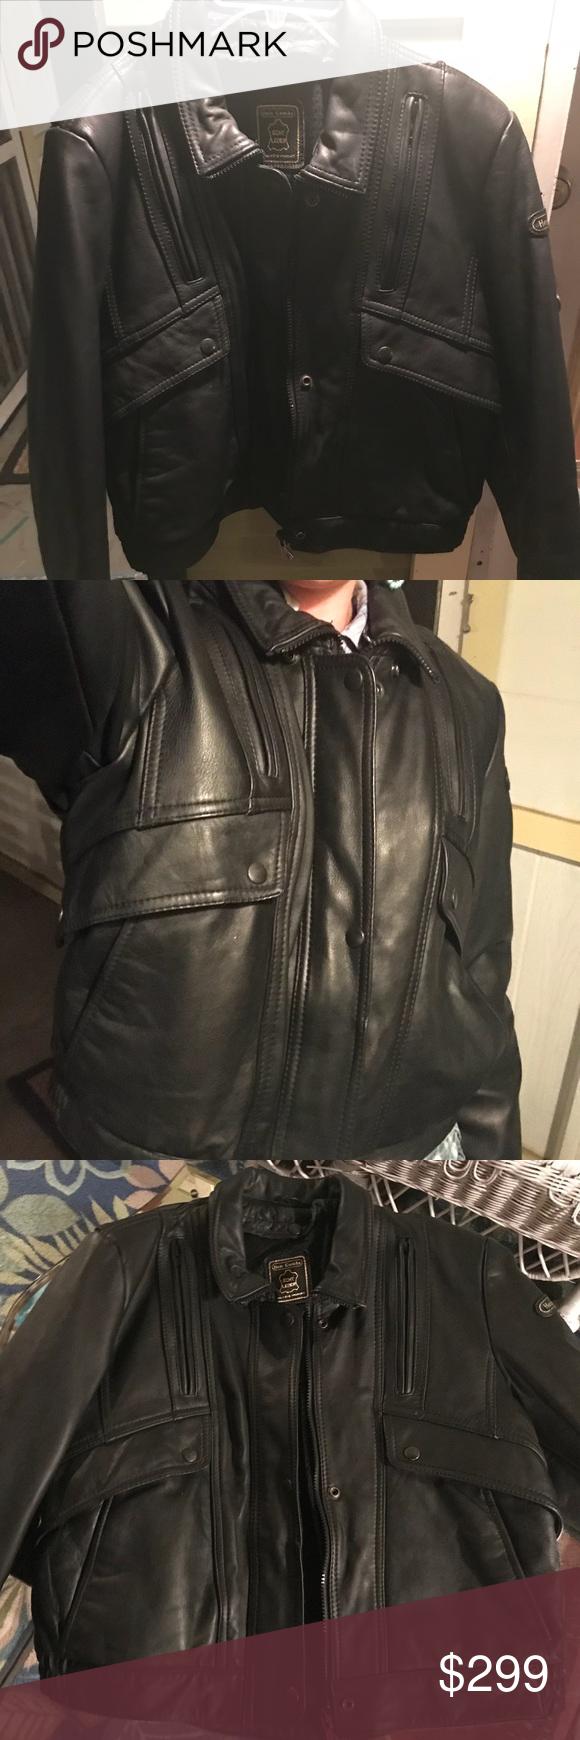 Hein Gericke black leather jacket, like new 38 Worn only